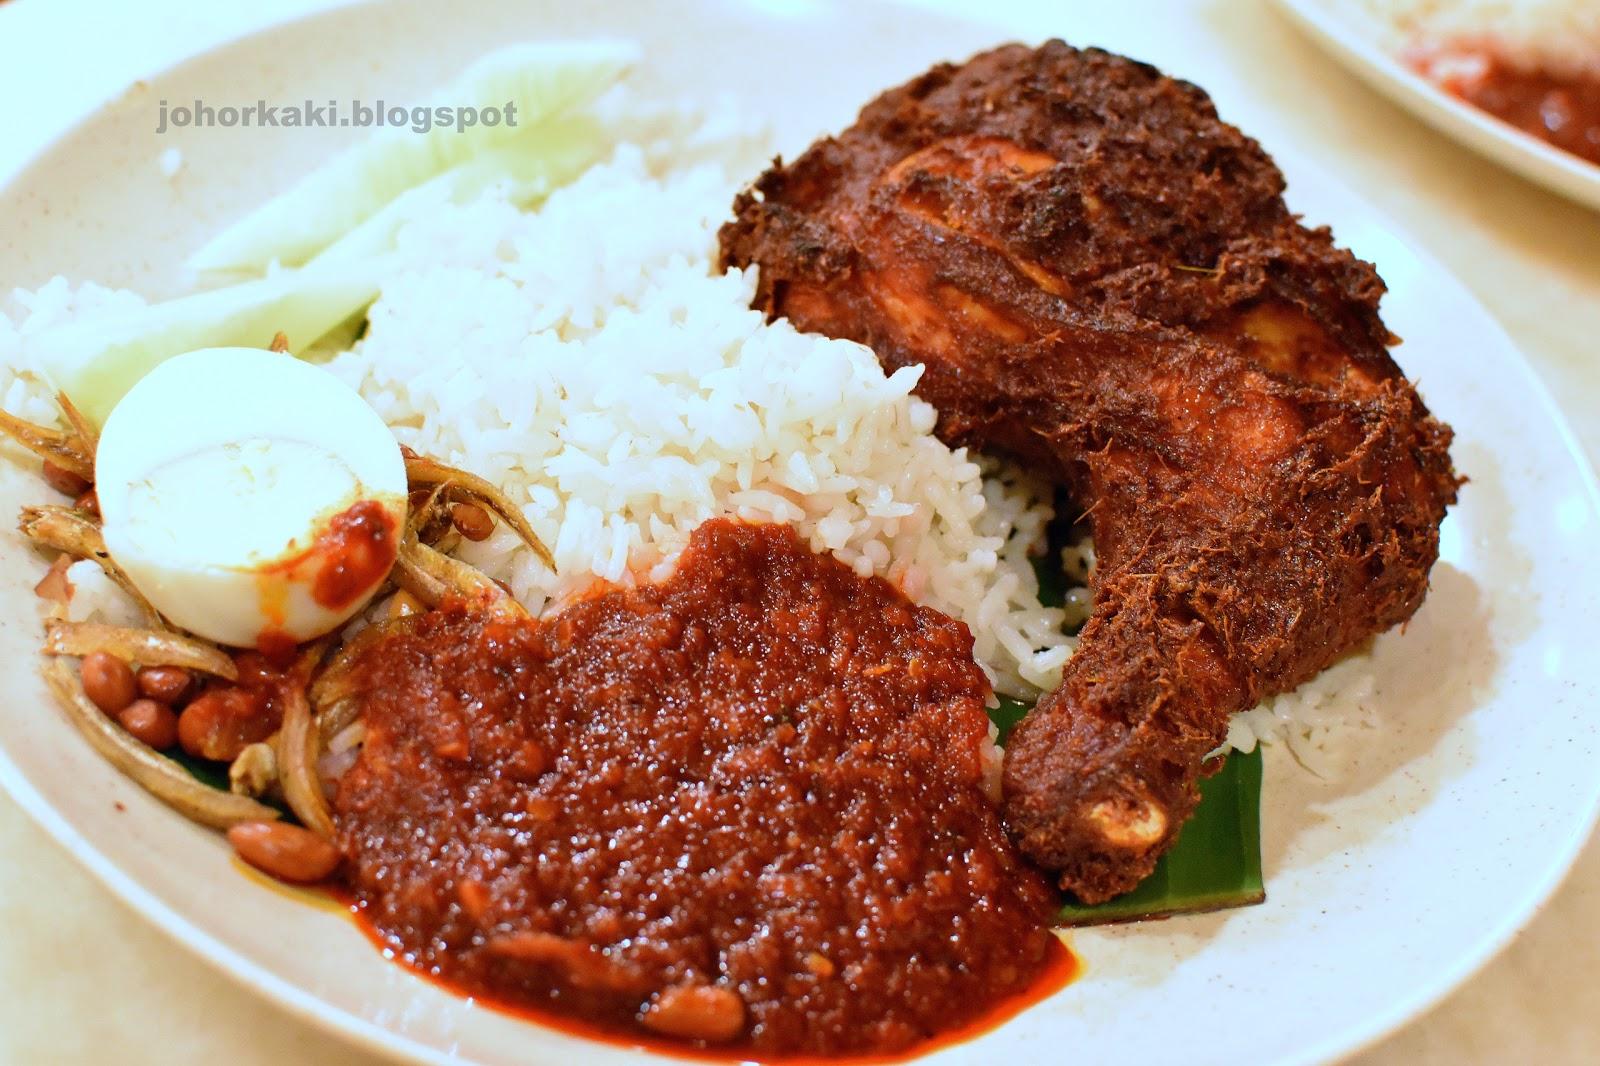 Village Park Nasi Lemak Uptown Damansara Pj Near Kl Johor Kaki Travels For Food